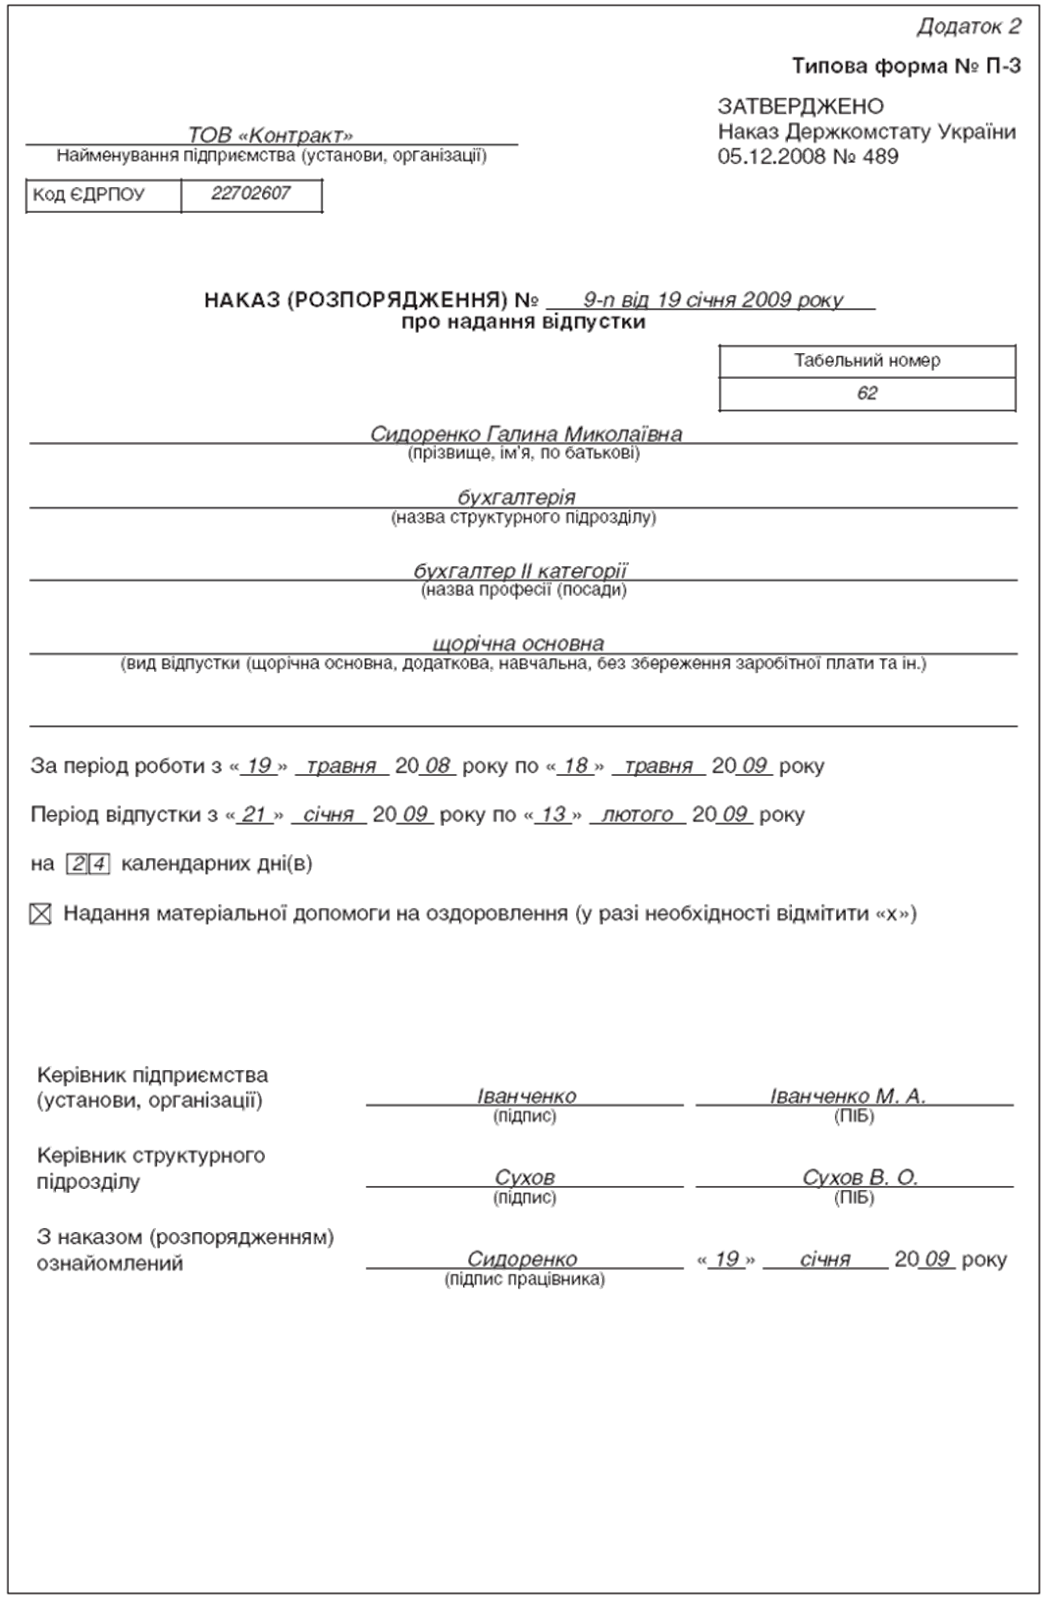 reshebnik-russkiy-yazik-russkiy-9-klass-rudyakov-frolova